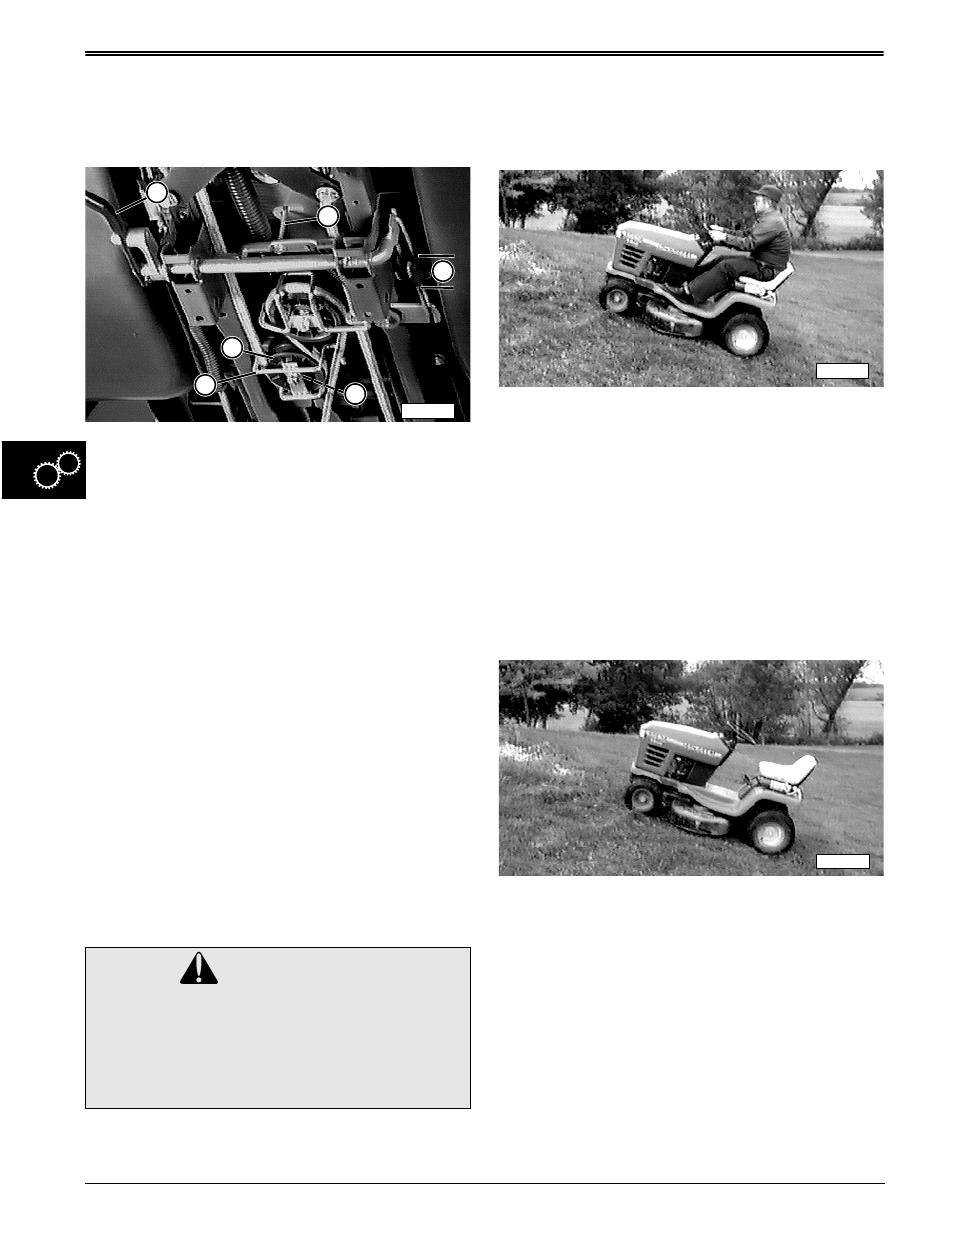 Caution, Clutch spring adjustment | John Deere stx38 User Manual | Page 200  / 314